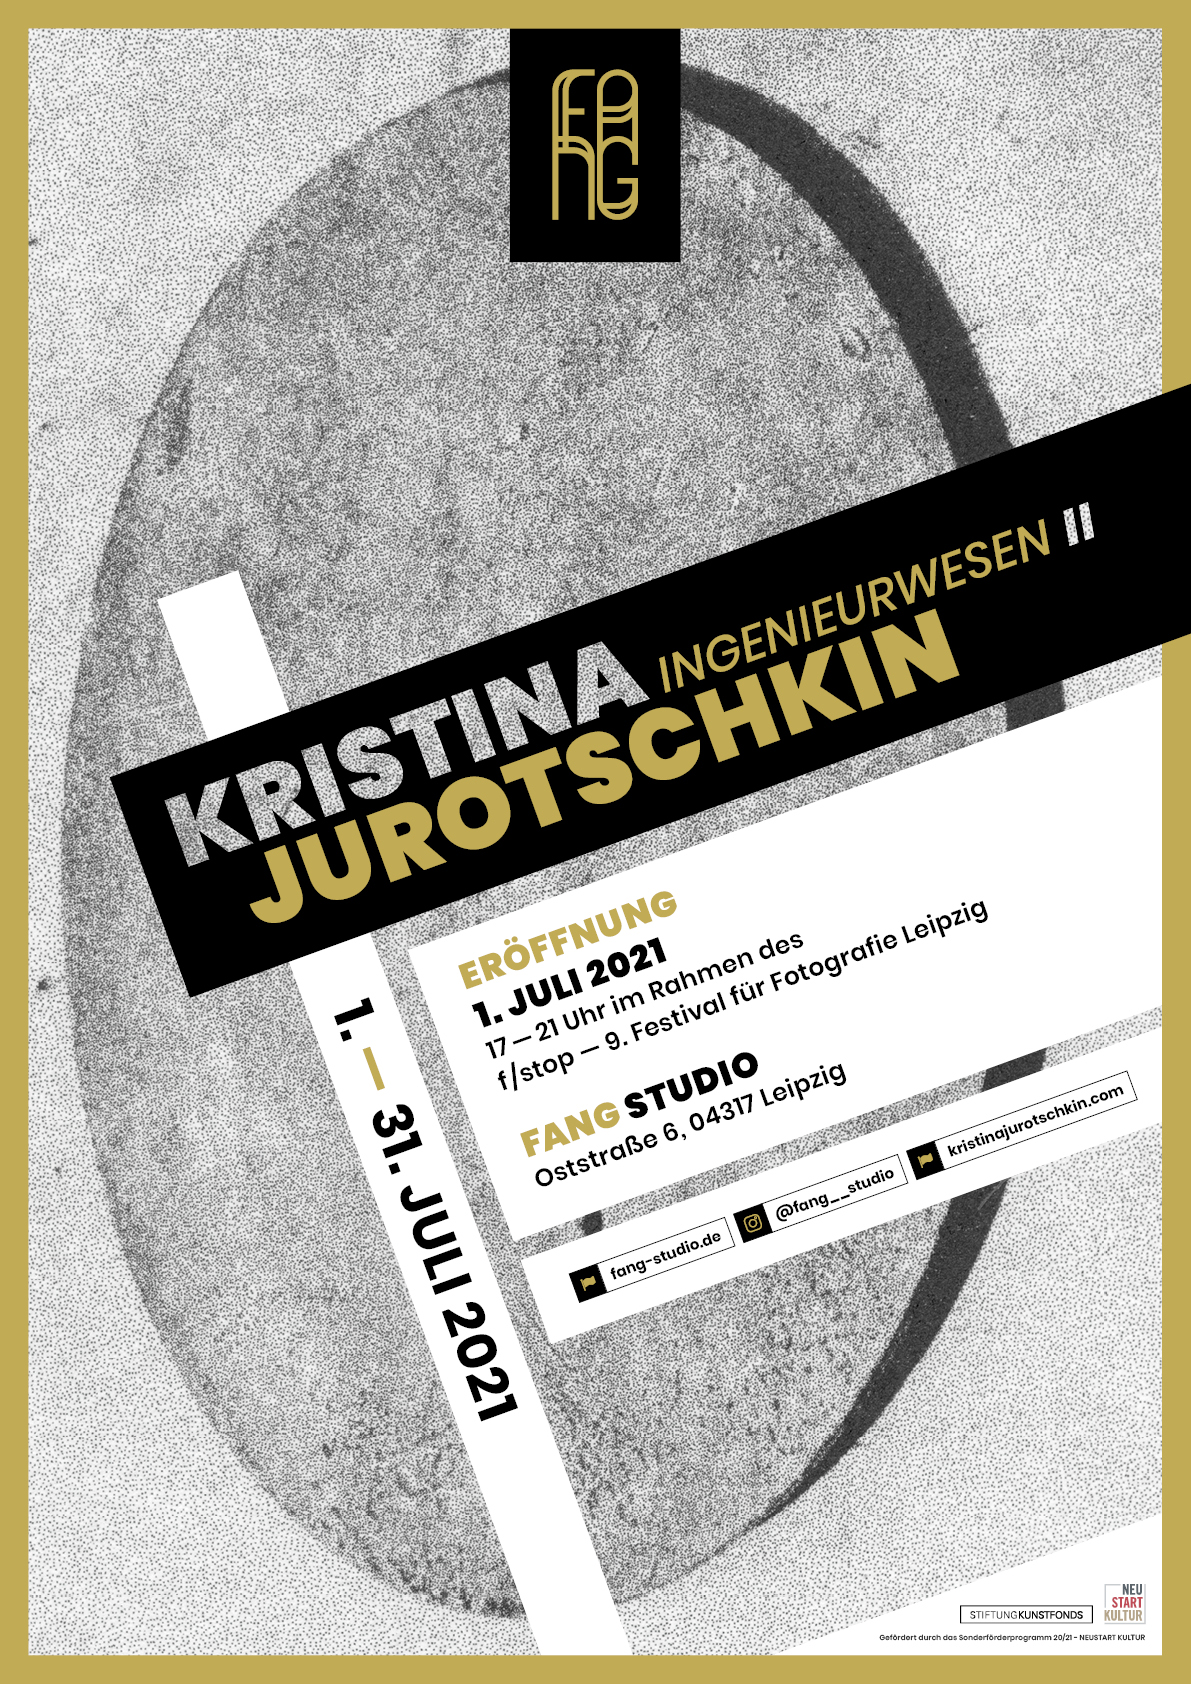 Kristina Jurotschkin – Ingenieurwesen II